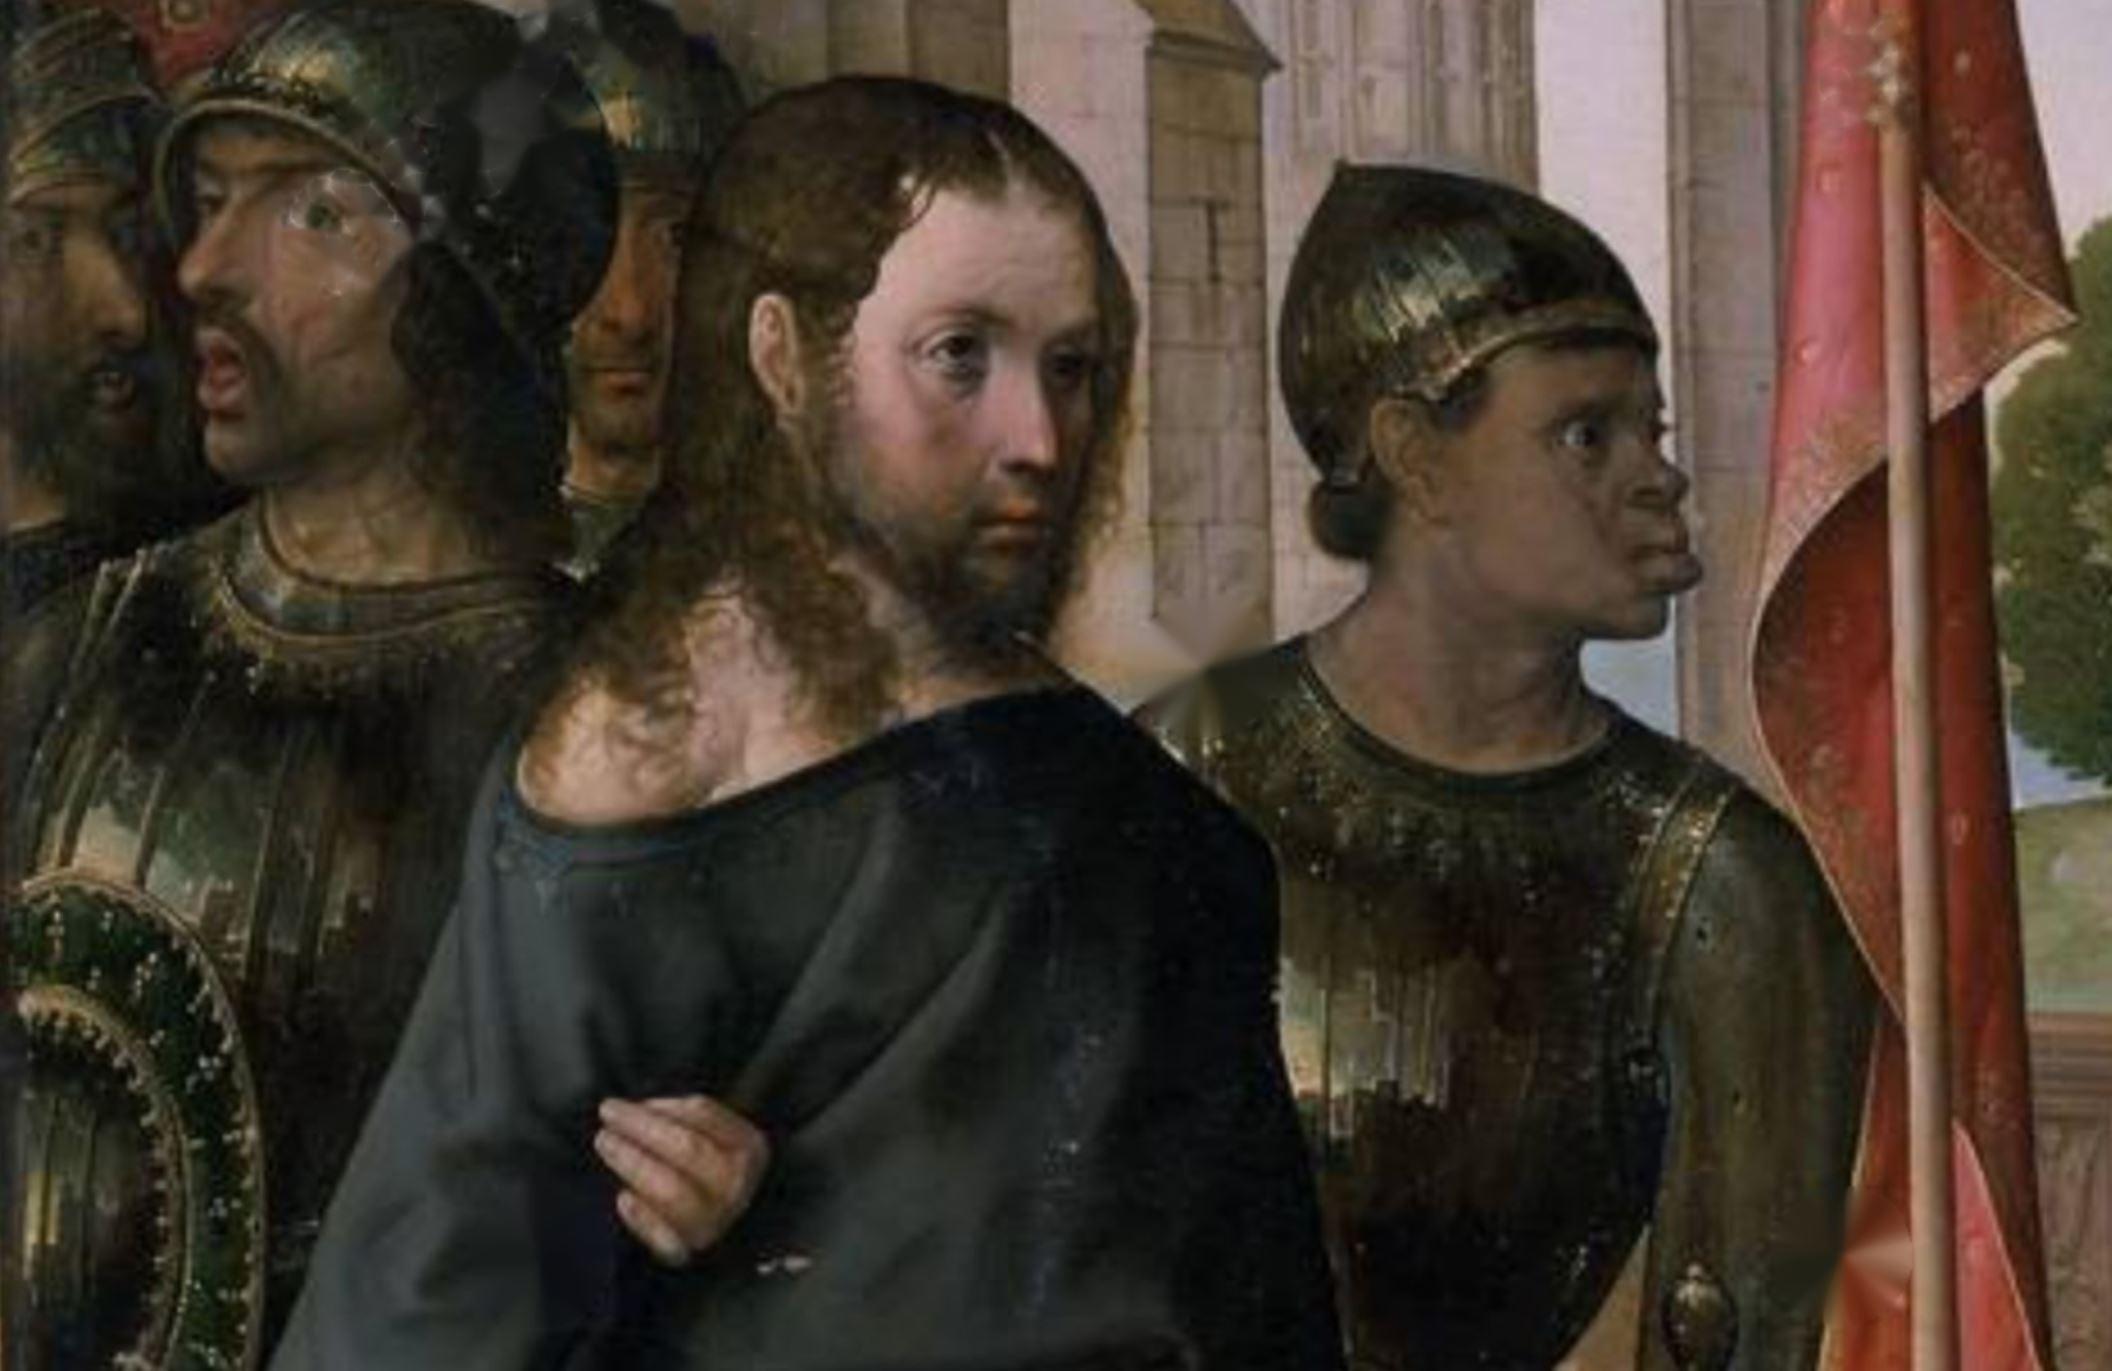 juan de Flandes 1509 Le Christ devant Pilate RETABLO MAYOR DE LA CATEDRAL DE PALENCIA detail